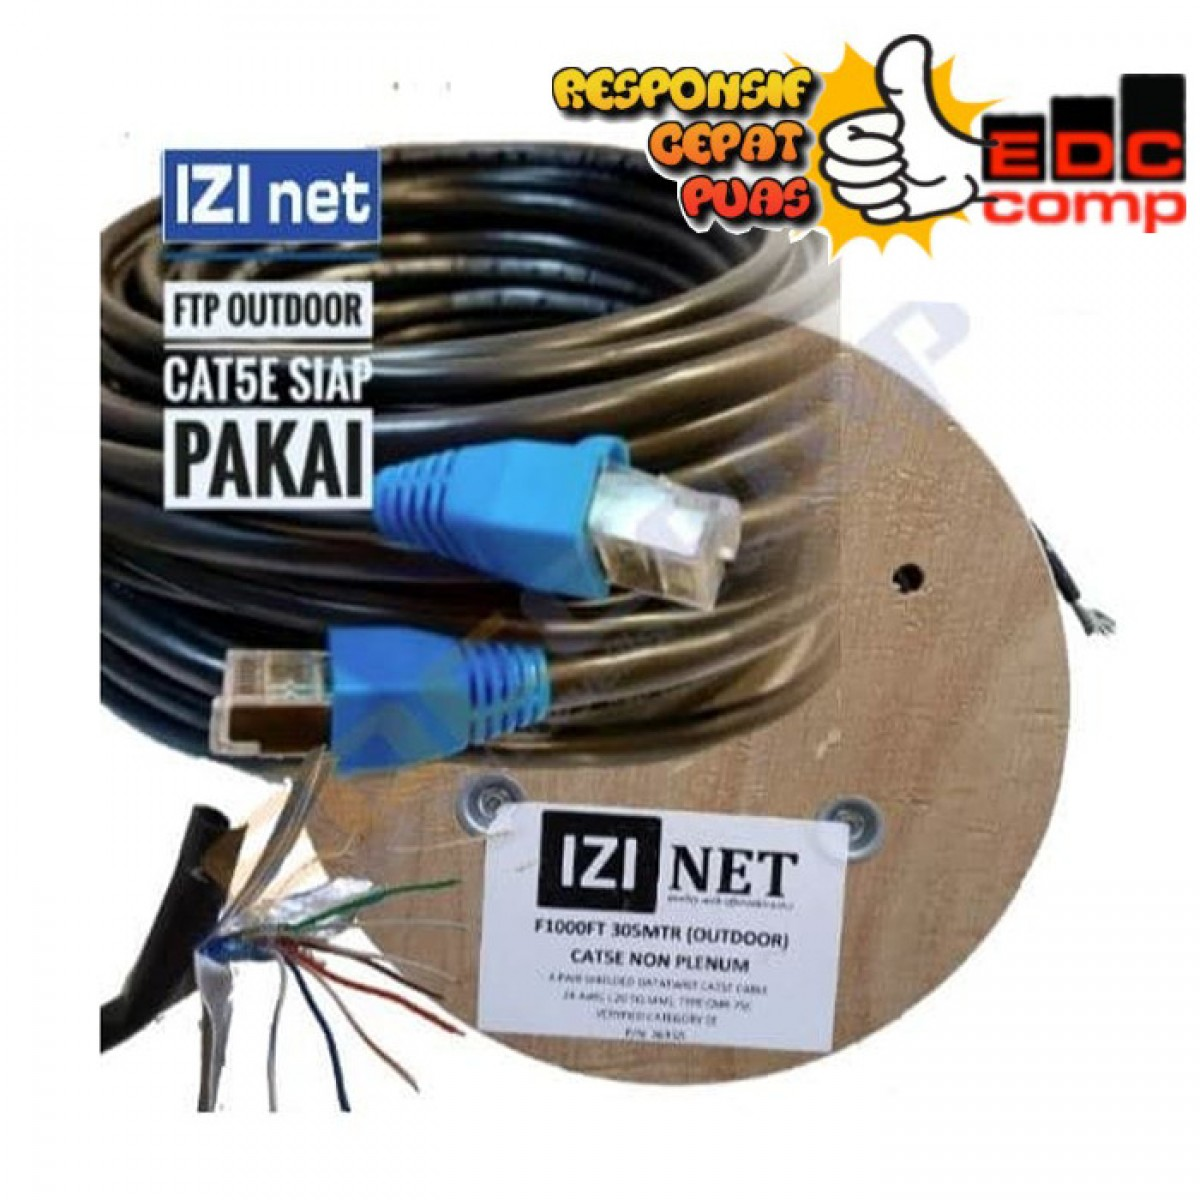 Cable STP/FTP Cat 5e Outdoor Cable 30 Meter IZI net Original - EdcComp